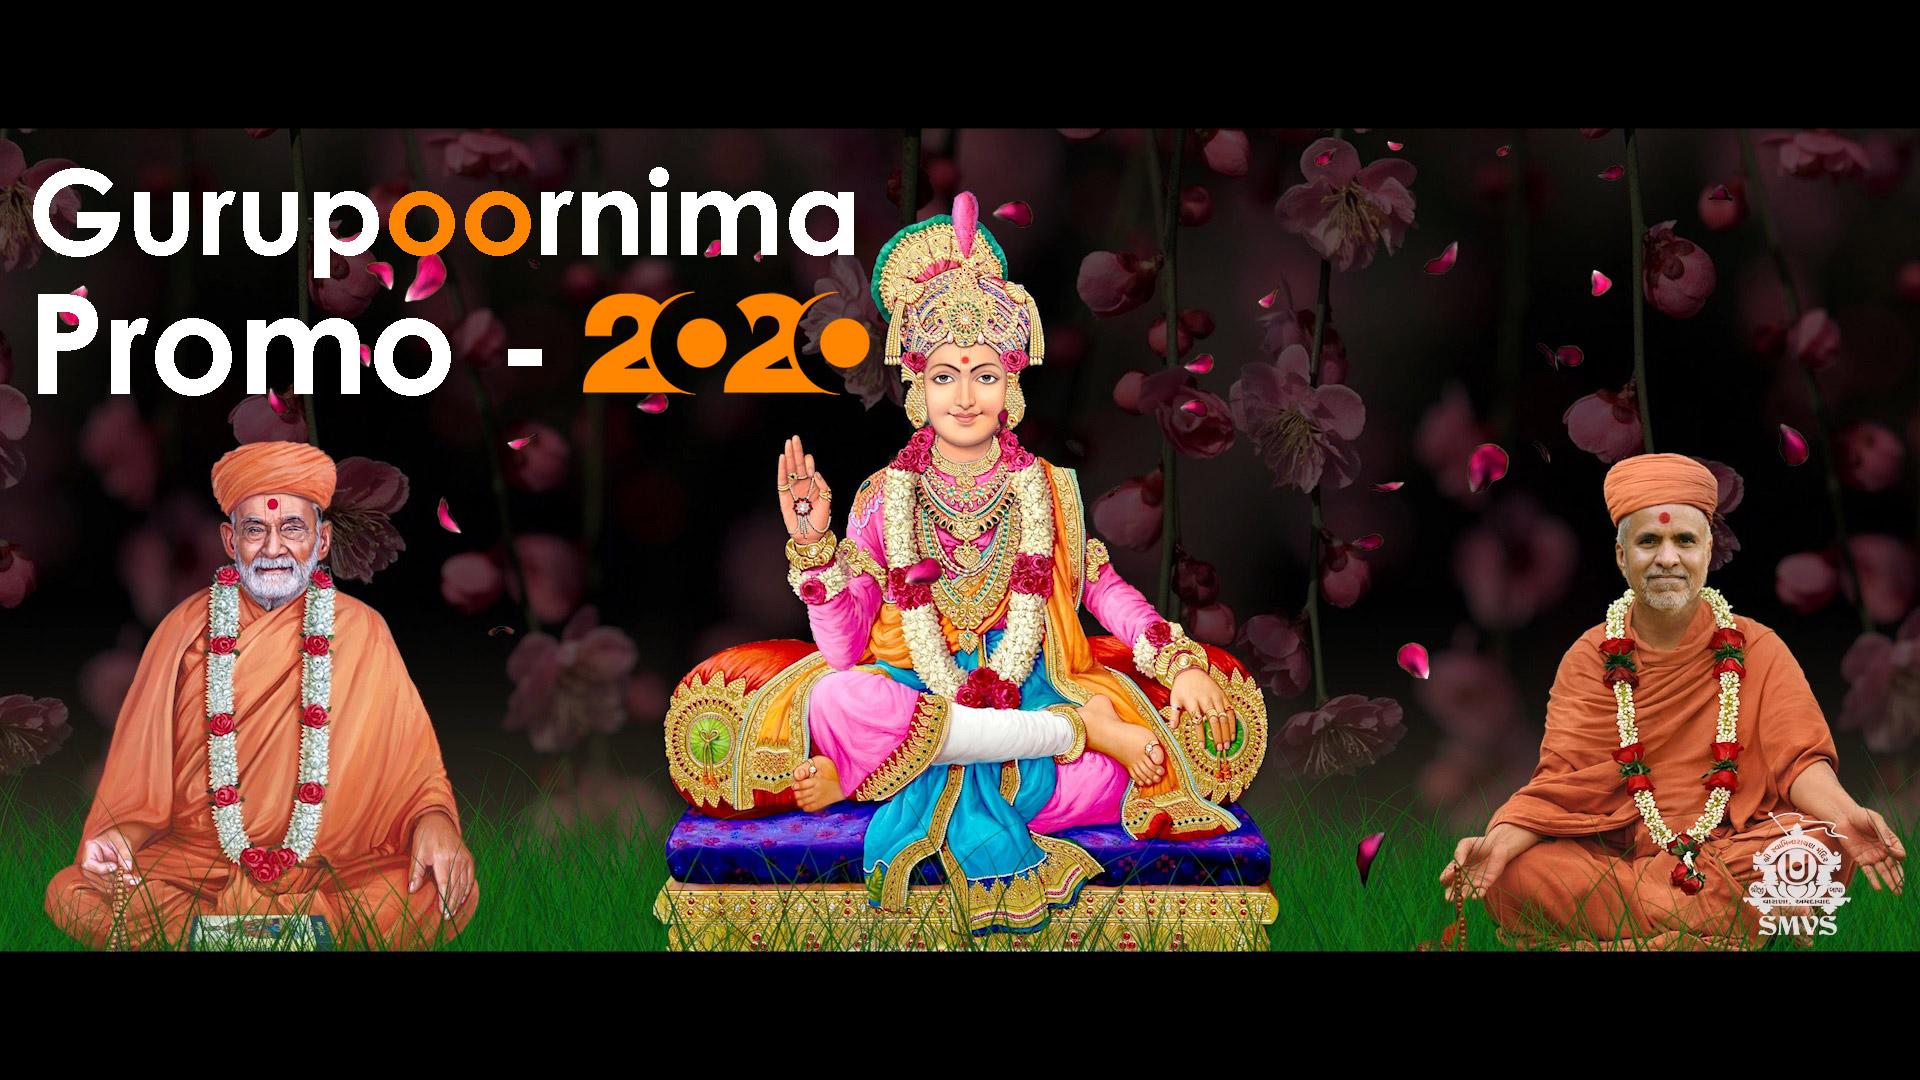 Gurupoornima Promo - 2020